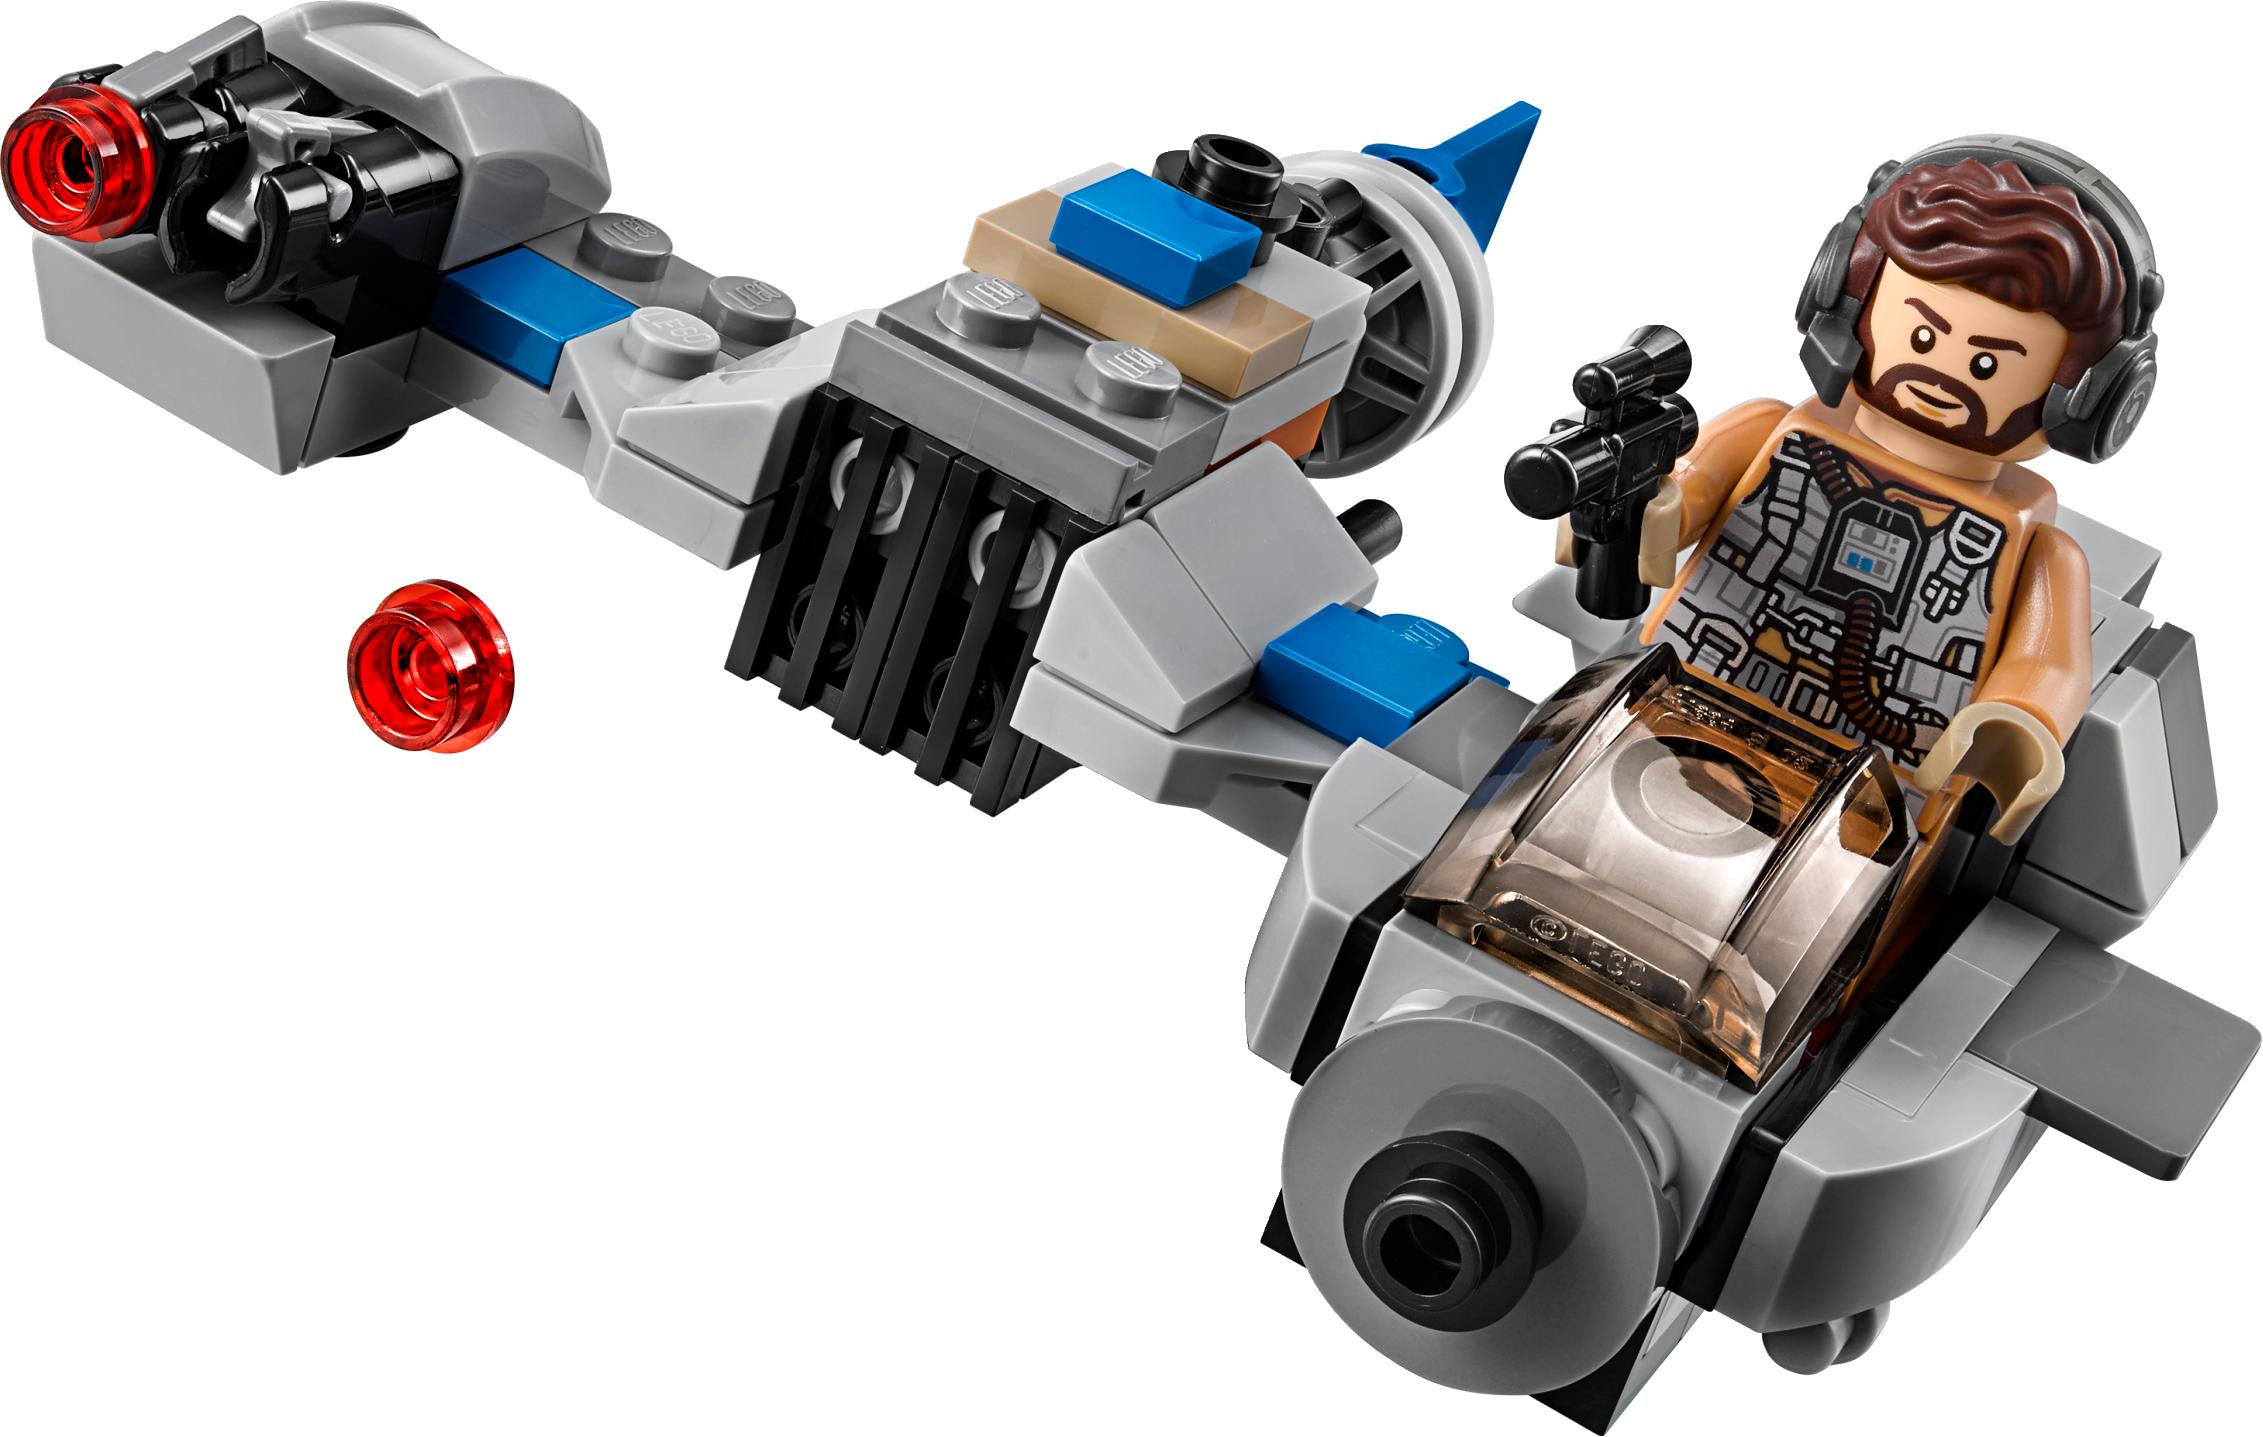 Ski Speeder™ vs. First Order Walker™ Microfighters